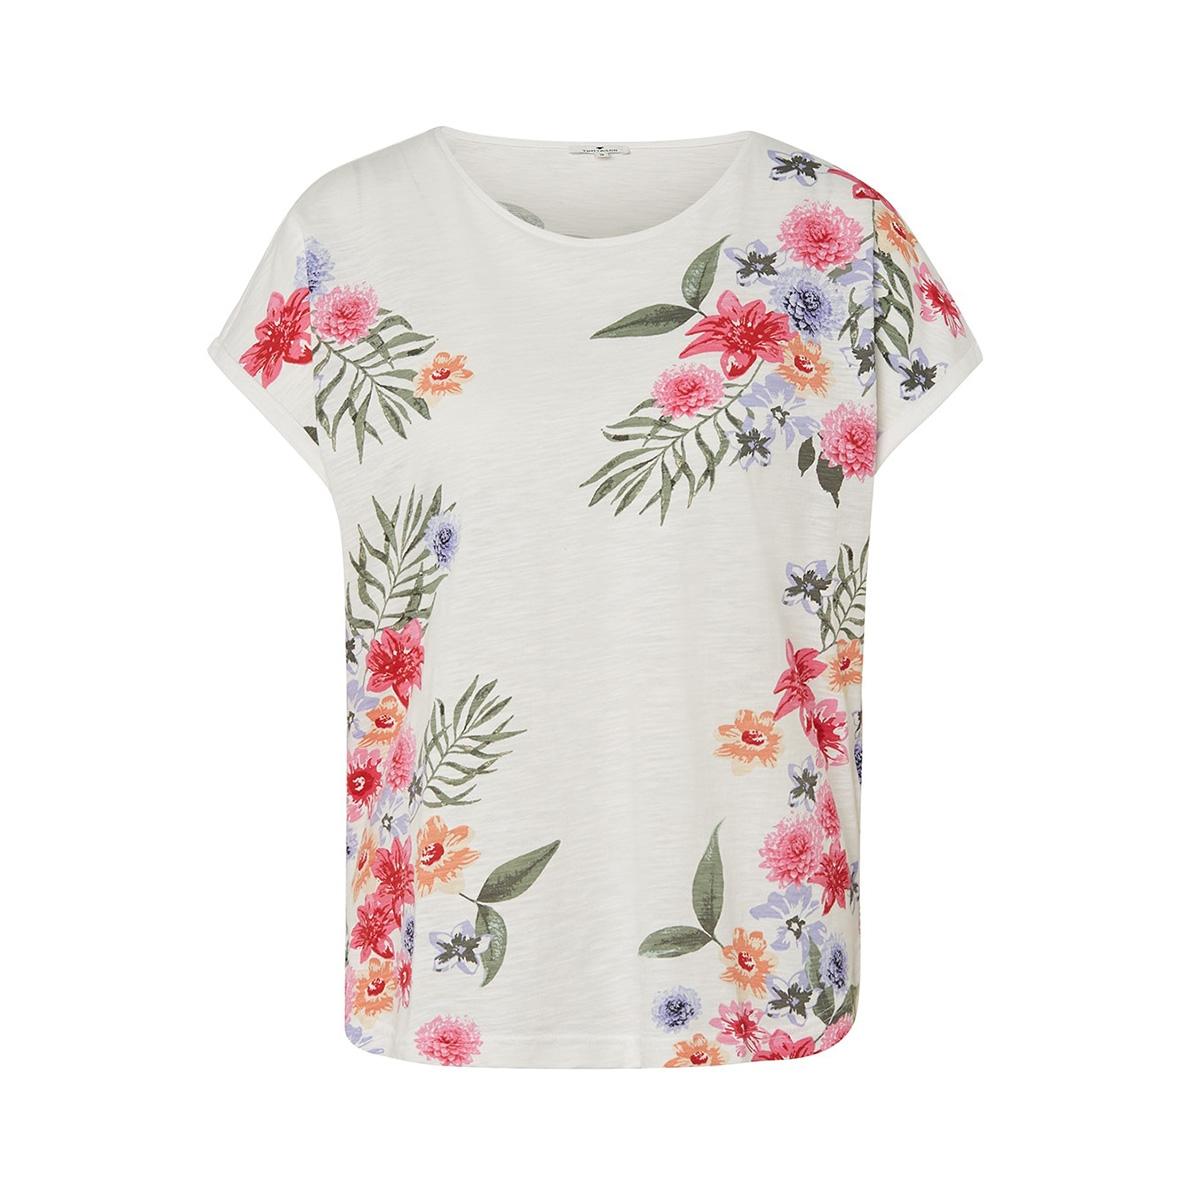 1009648xx70 tom tailor t-shirt 10315